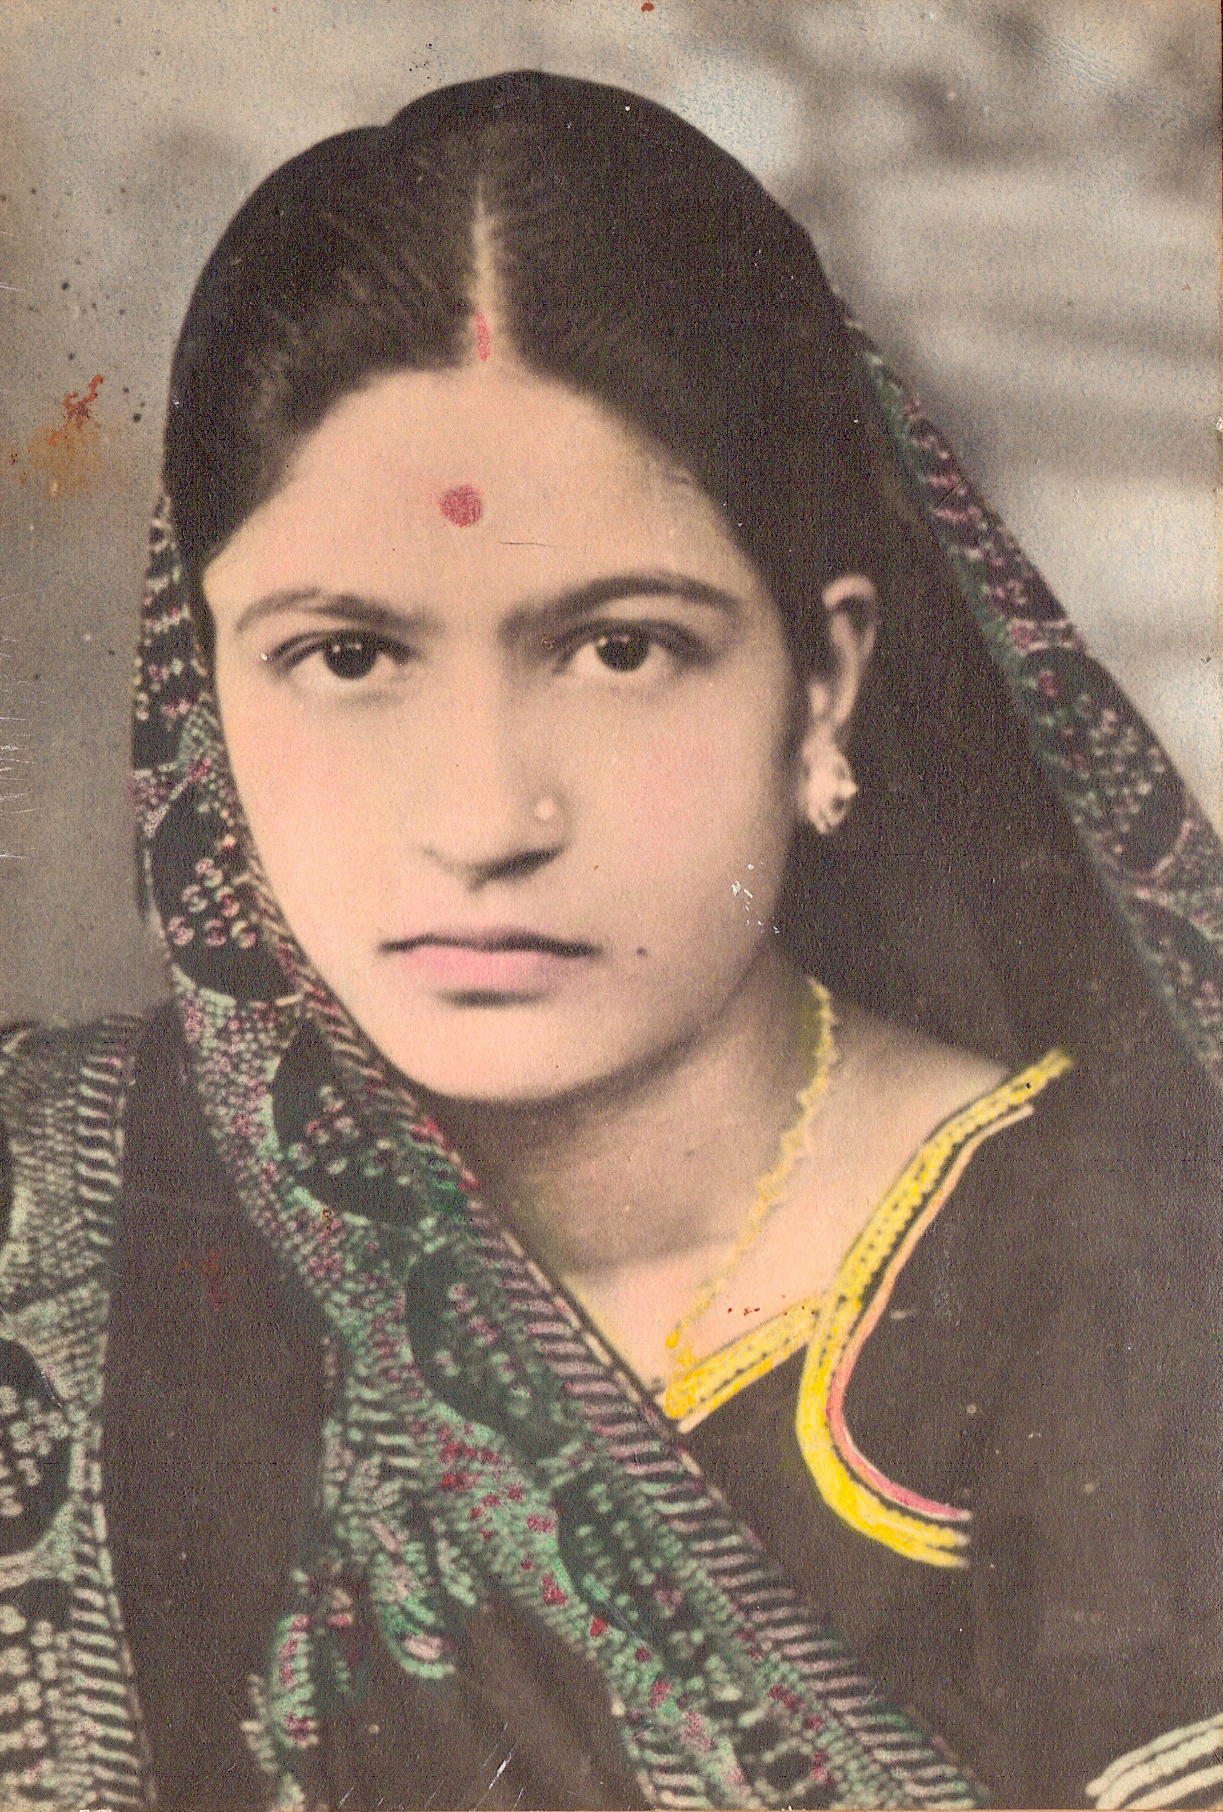 Dhirajlal Harakchand Parekh